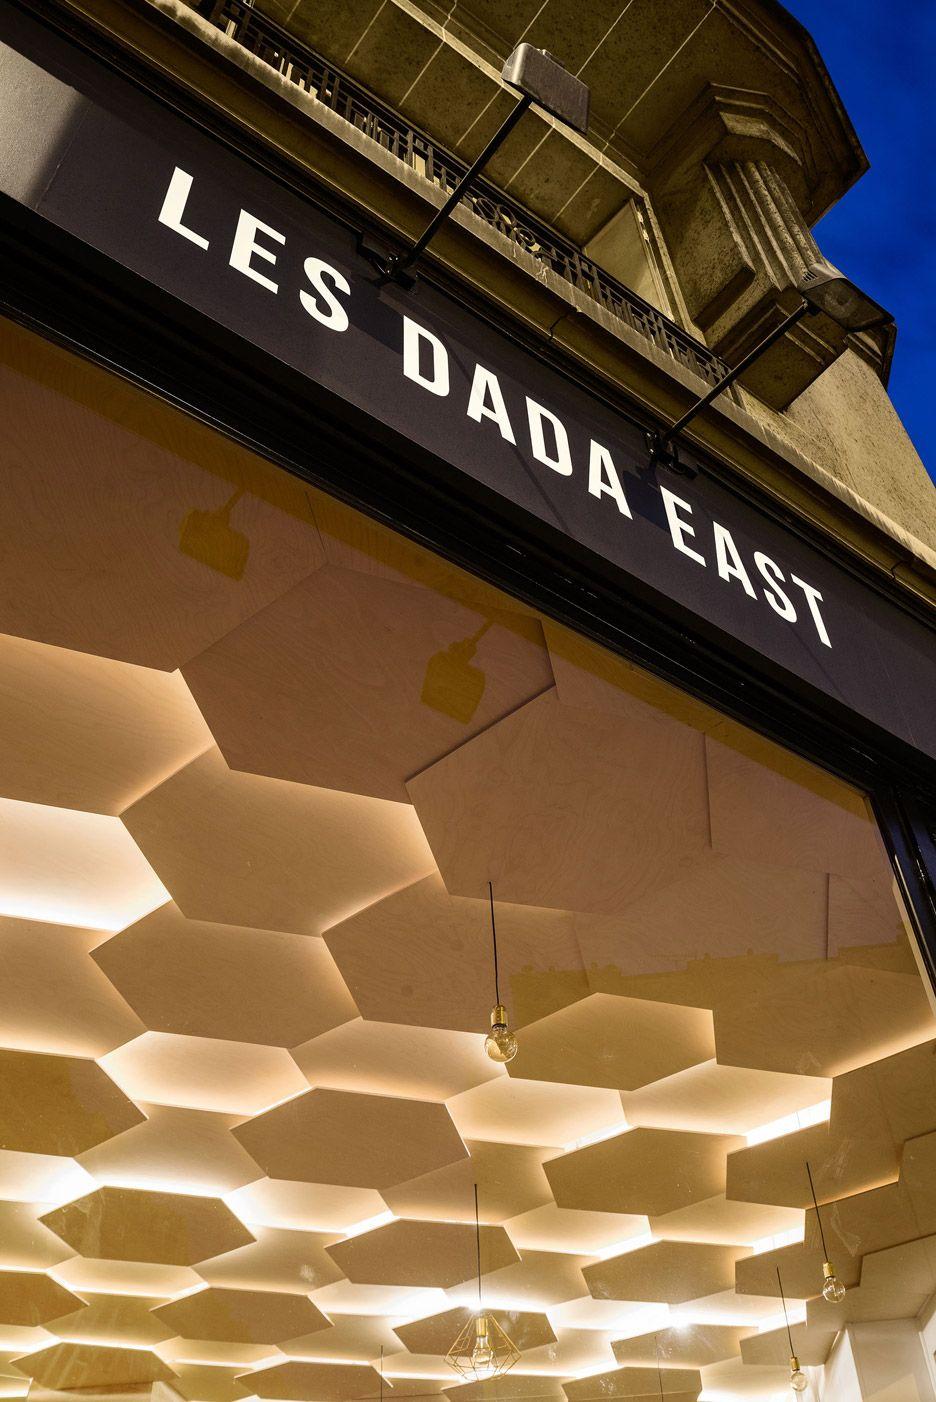 Joshua Florquin adds hexagonalpatterend ceiling to Les Dada East hair salon in Paris  Goethe